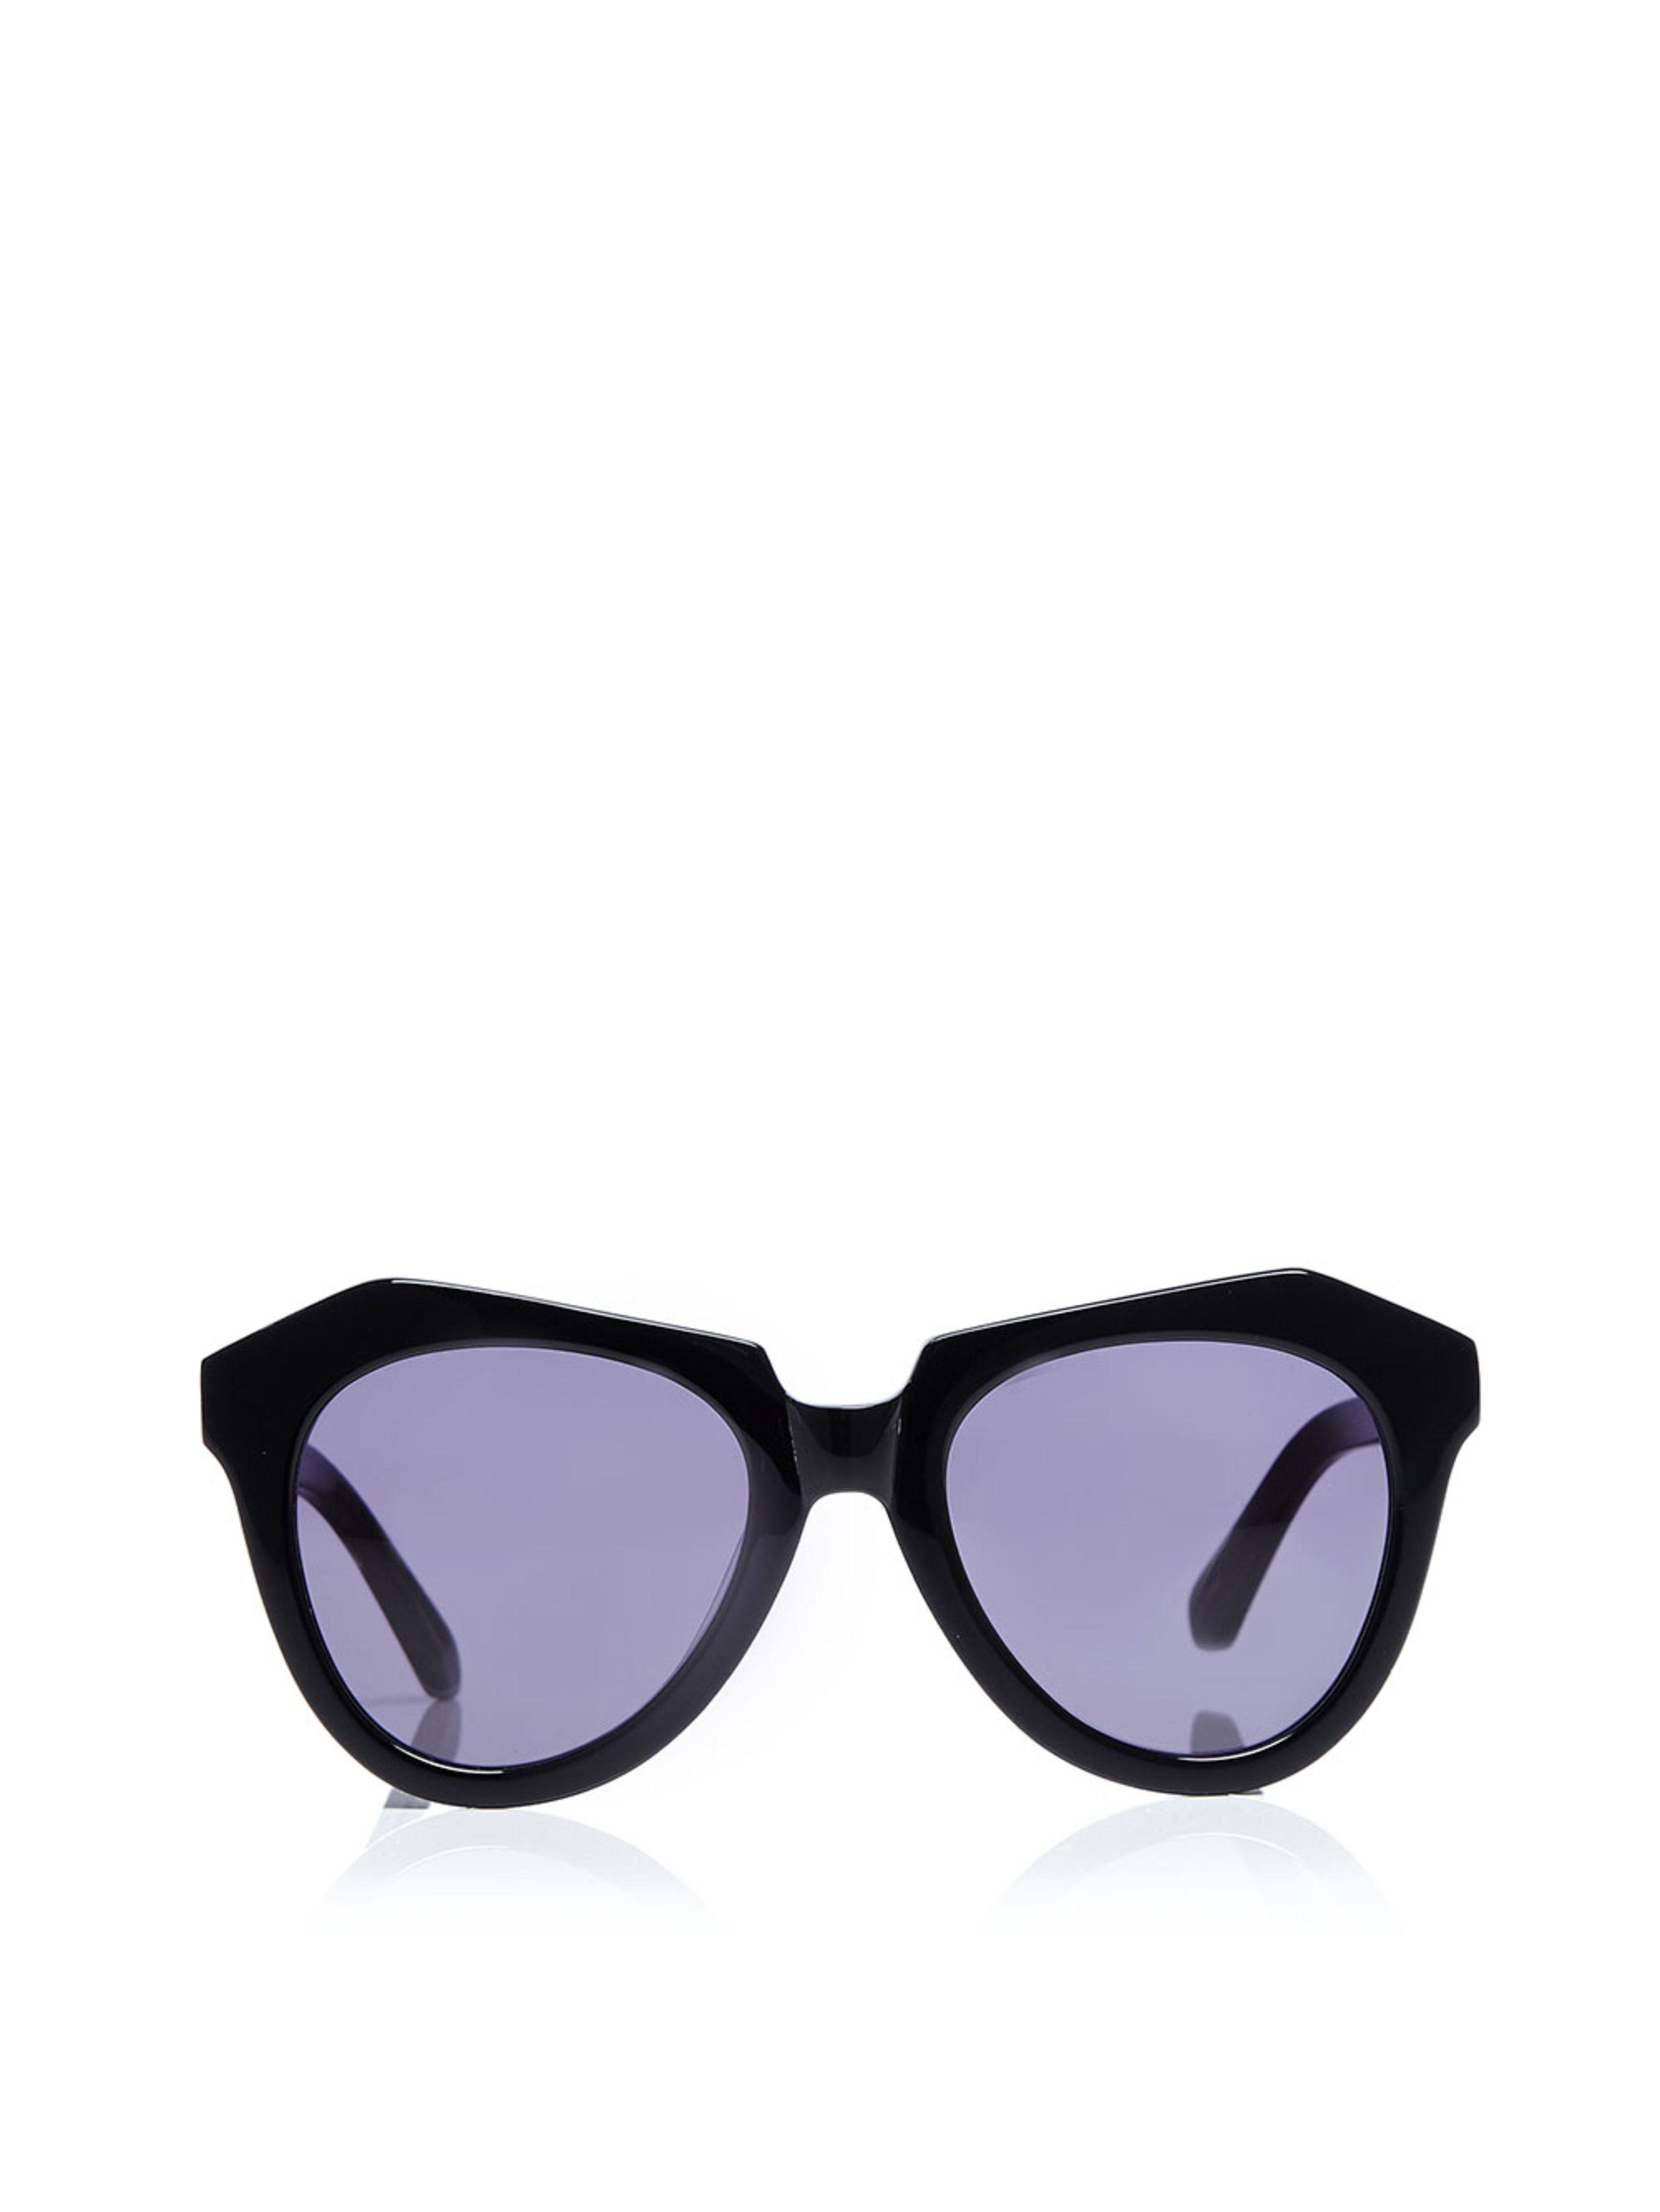 c4c19d23bab Karen Walker Eyewear Number One Sunglasses